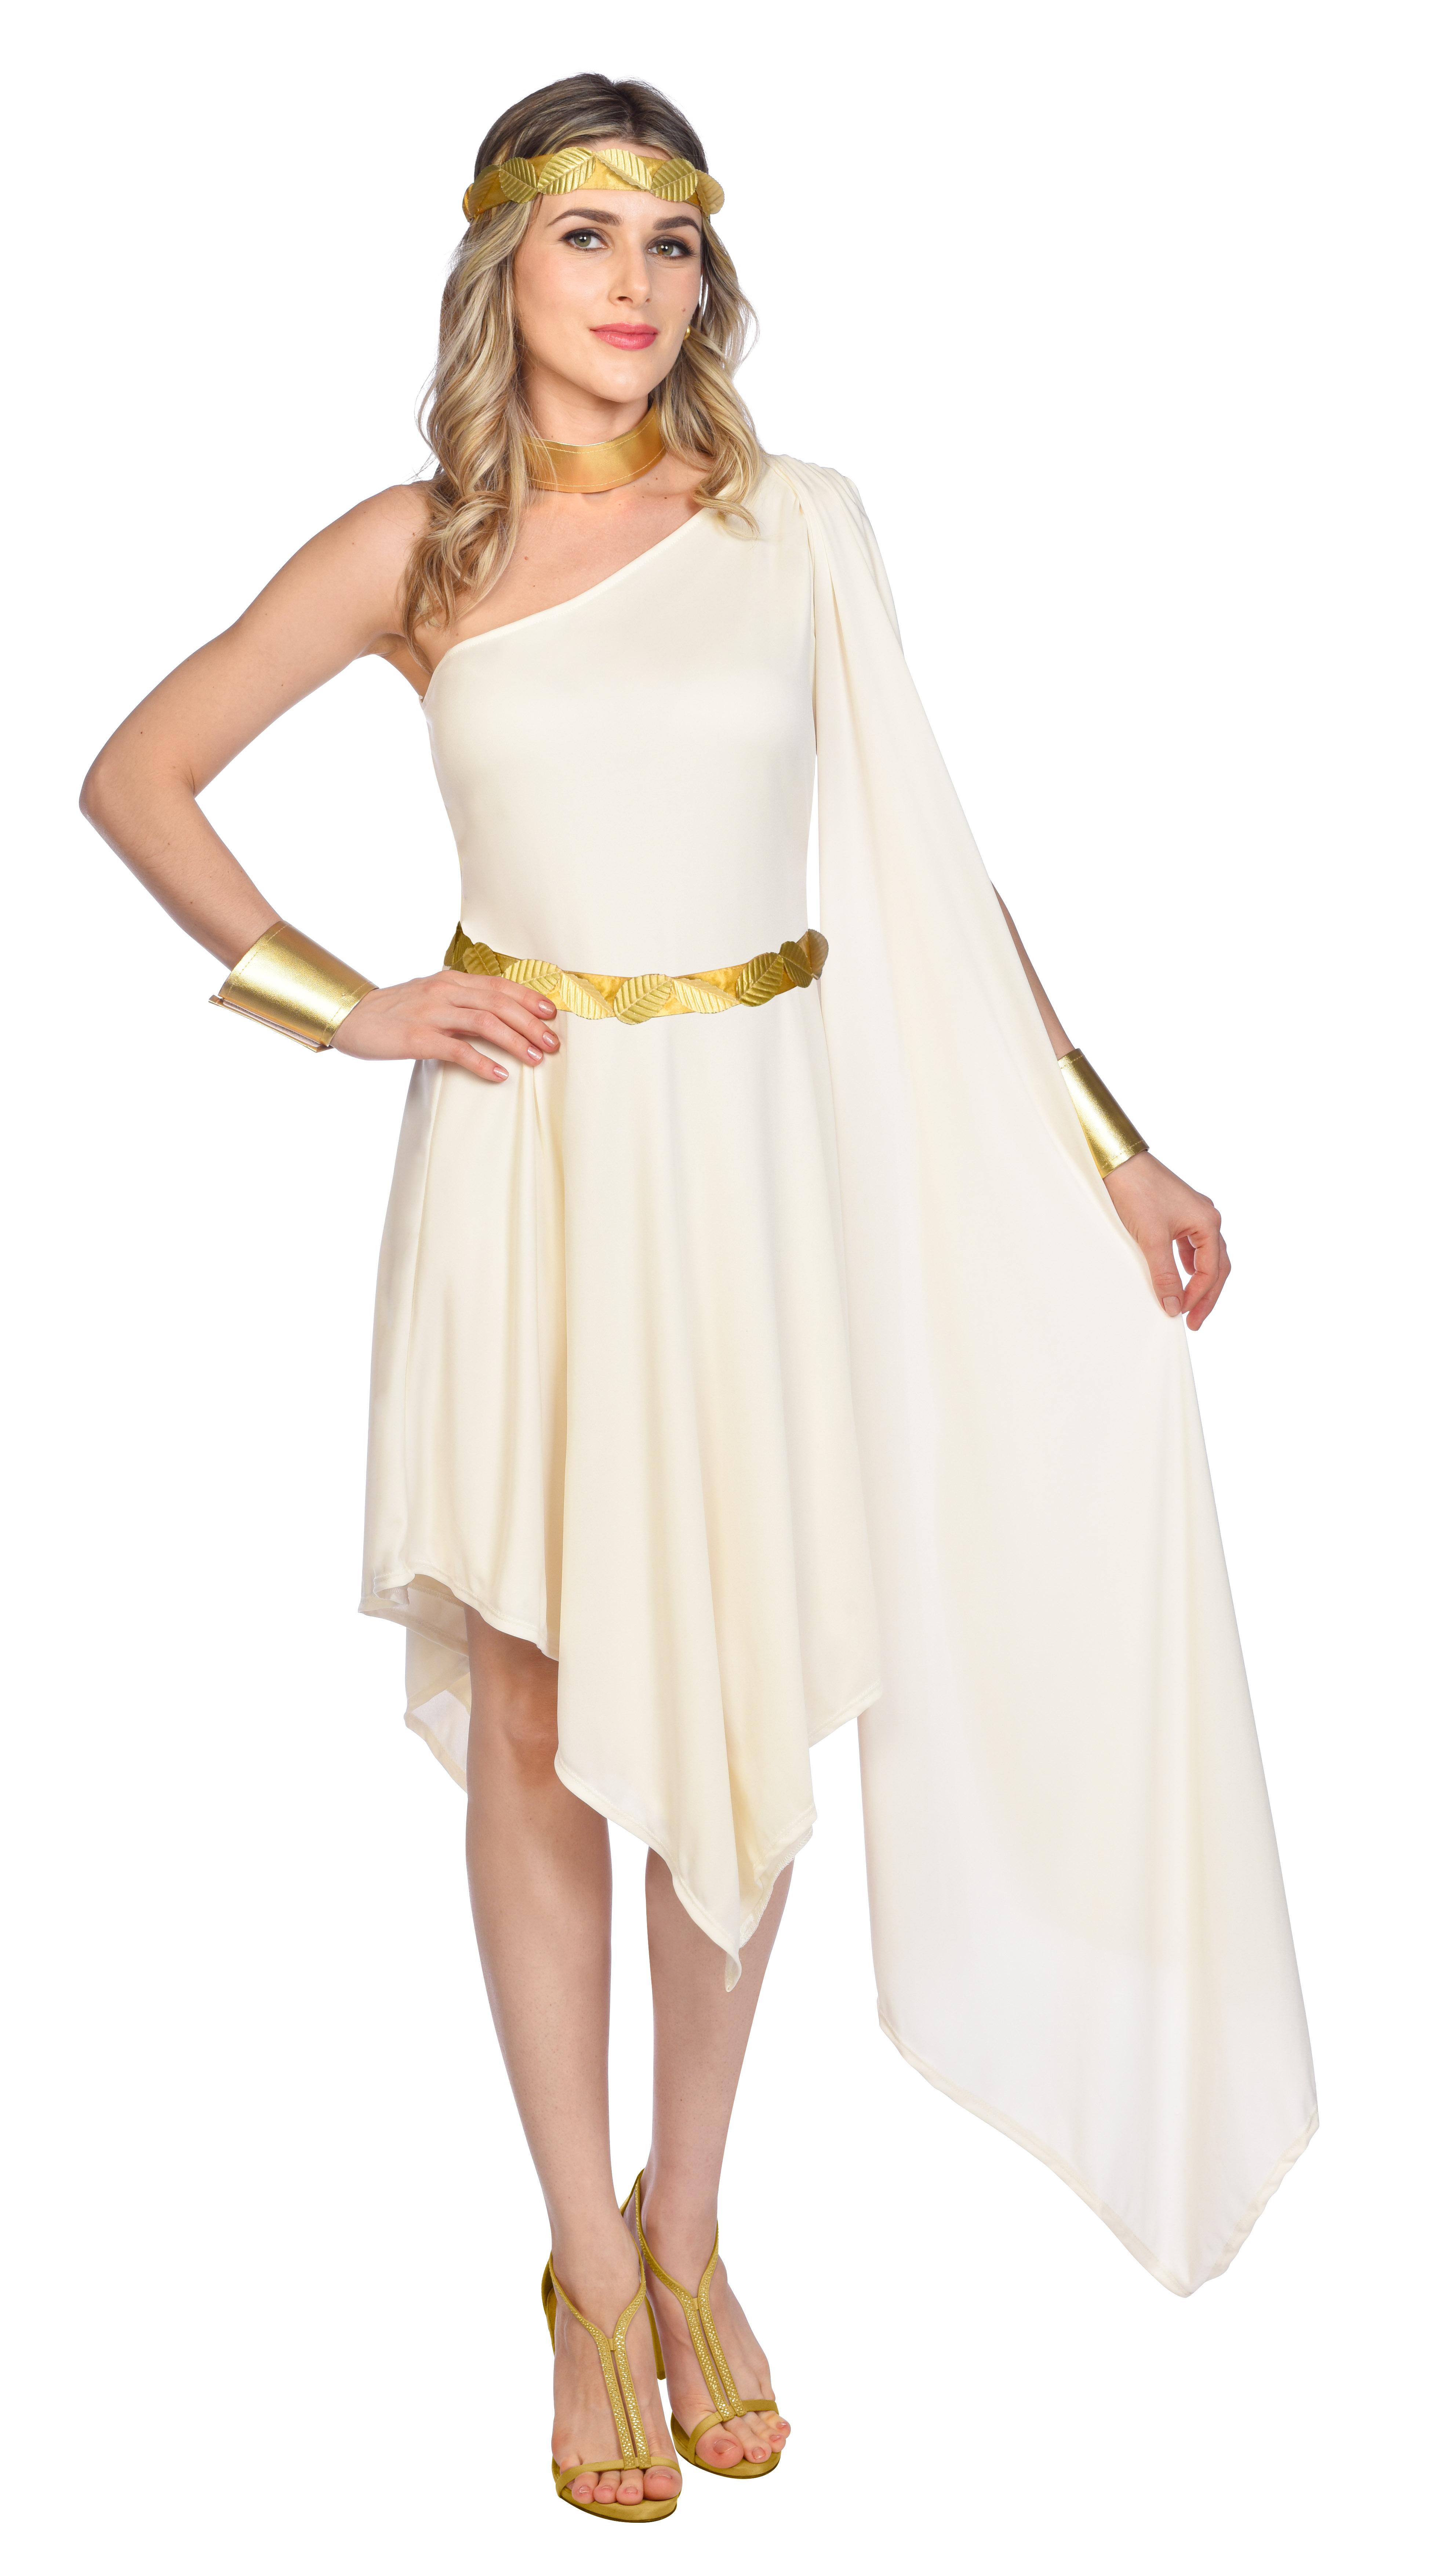 Indexbild 7 - Adult Ladies Golden Goddess Gladiator Greek Roman Toga Fancy Dress Costume New